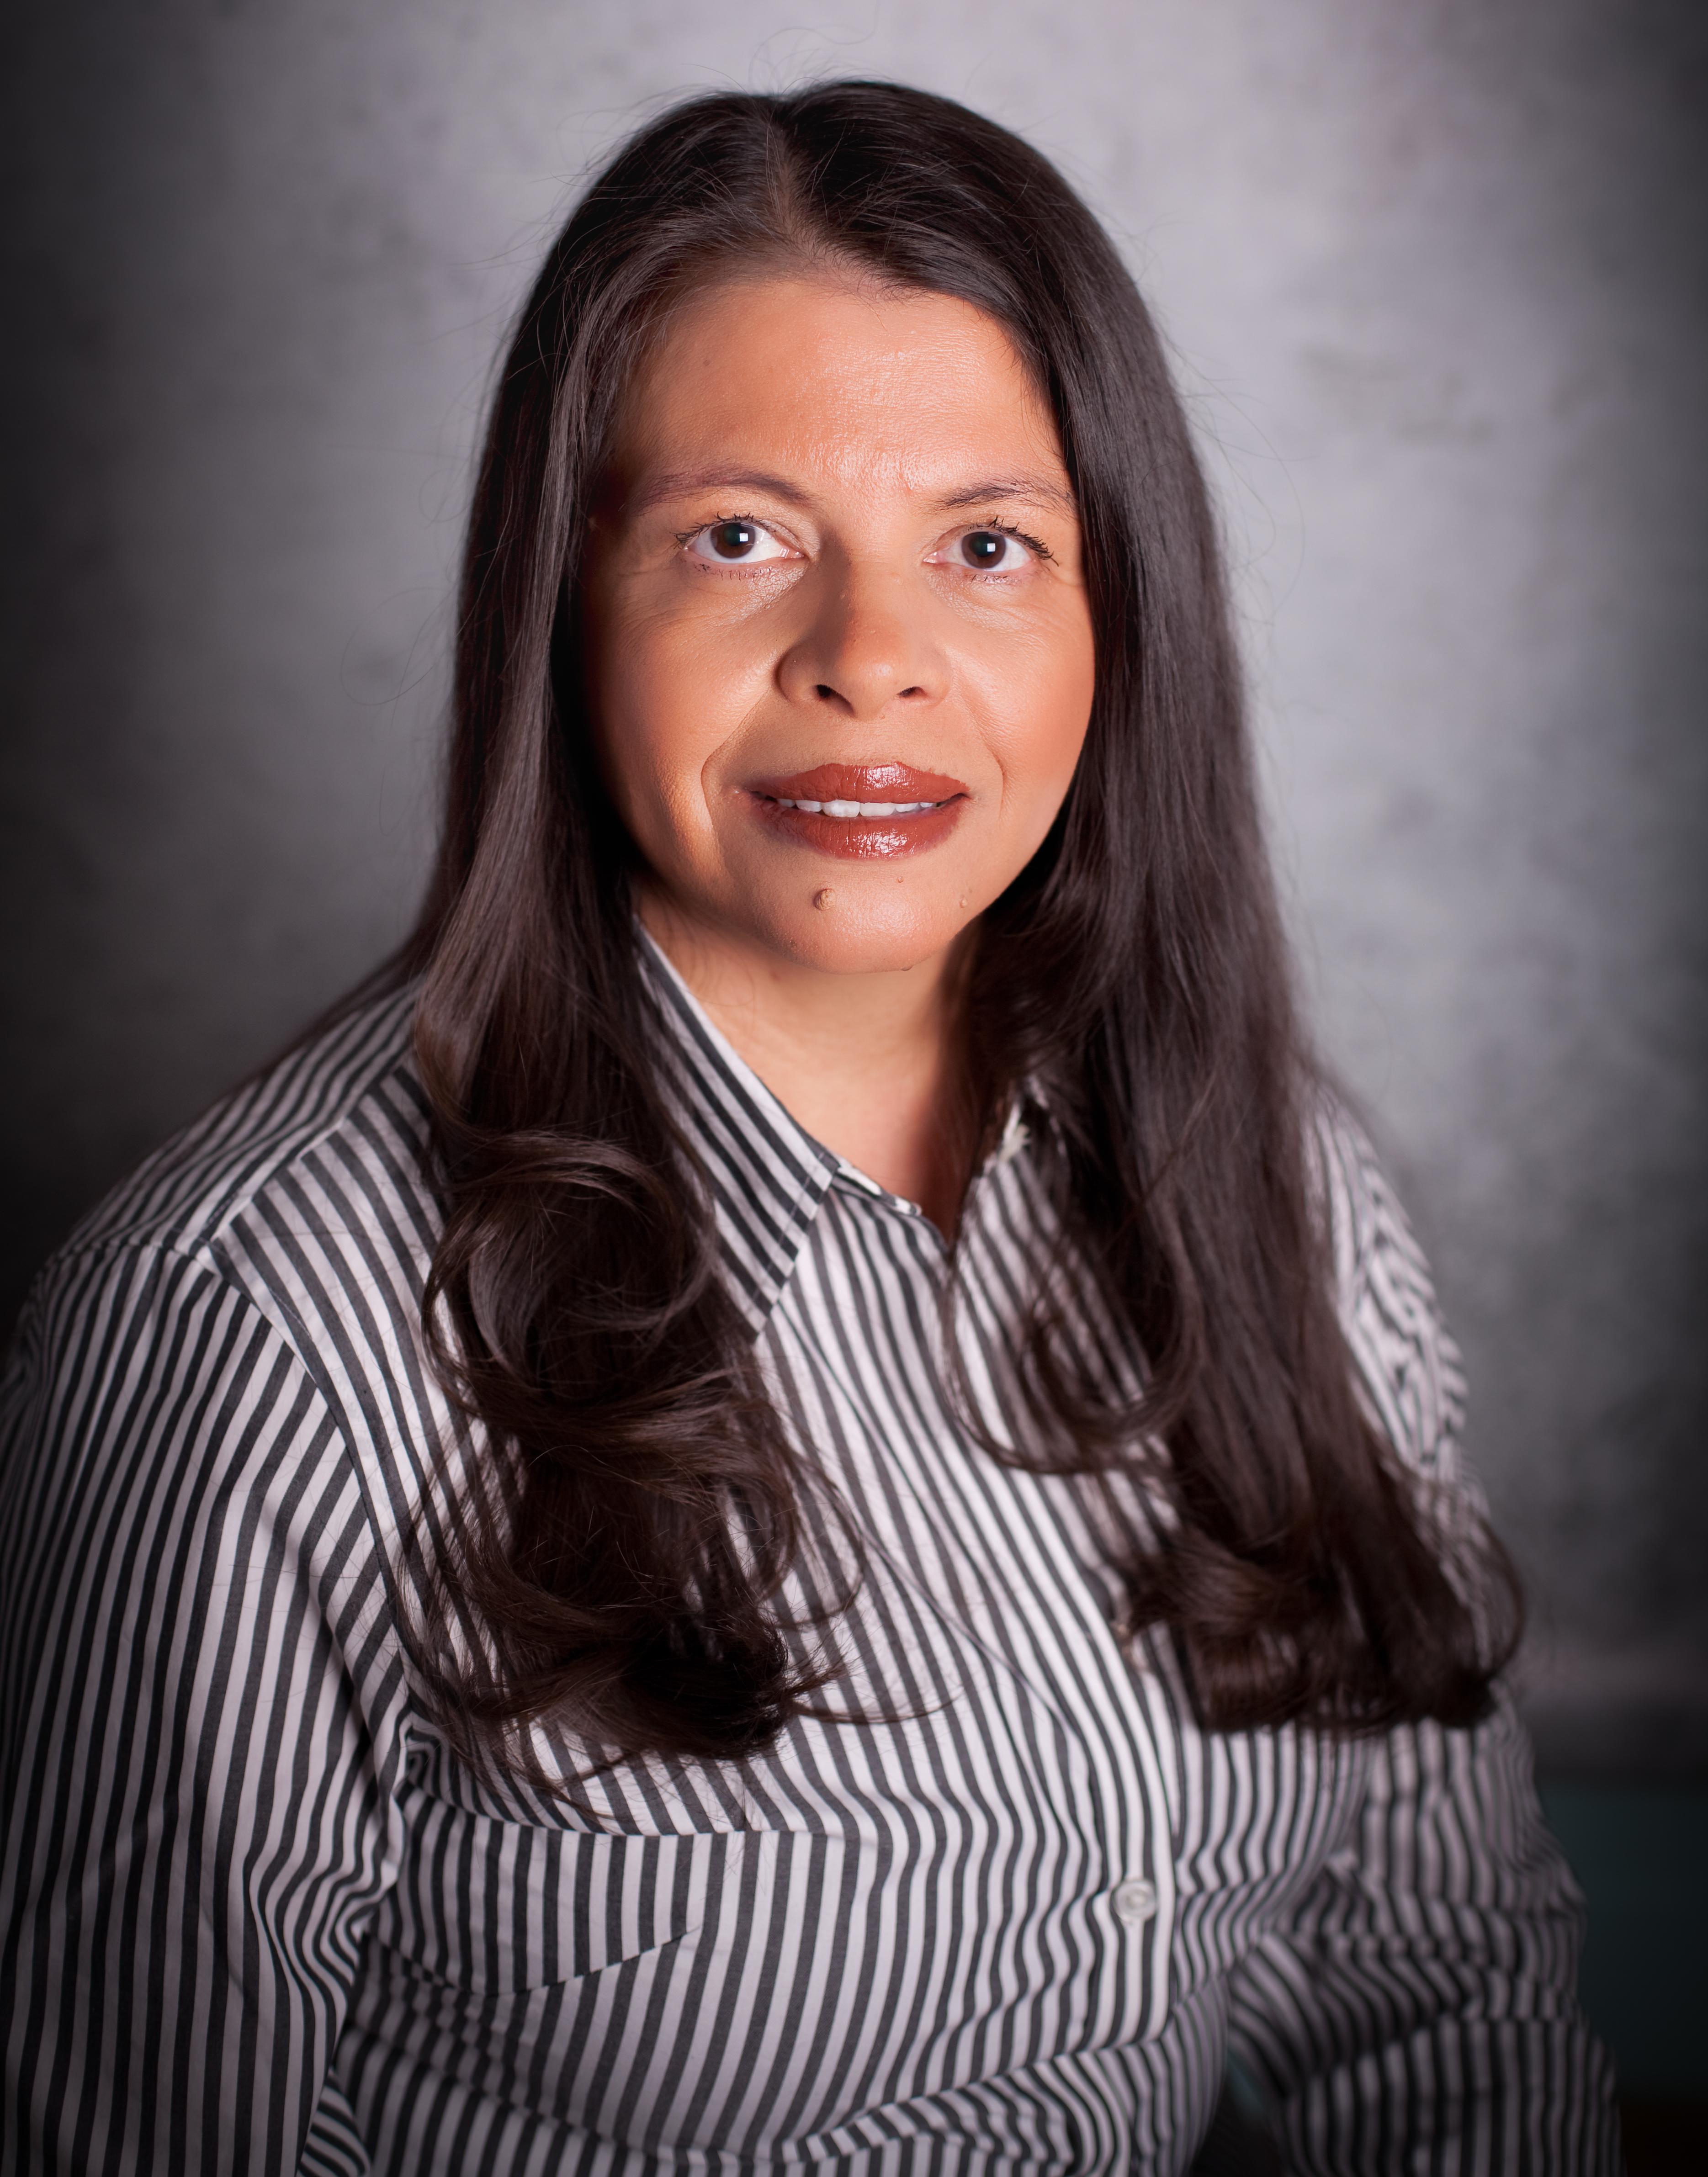 Office manager Juana Johnson